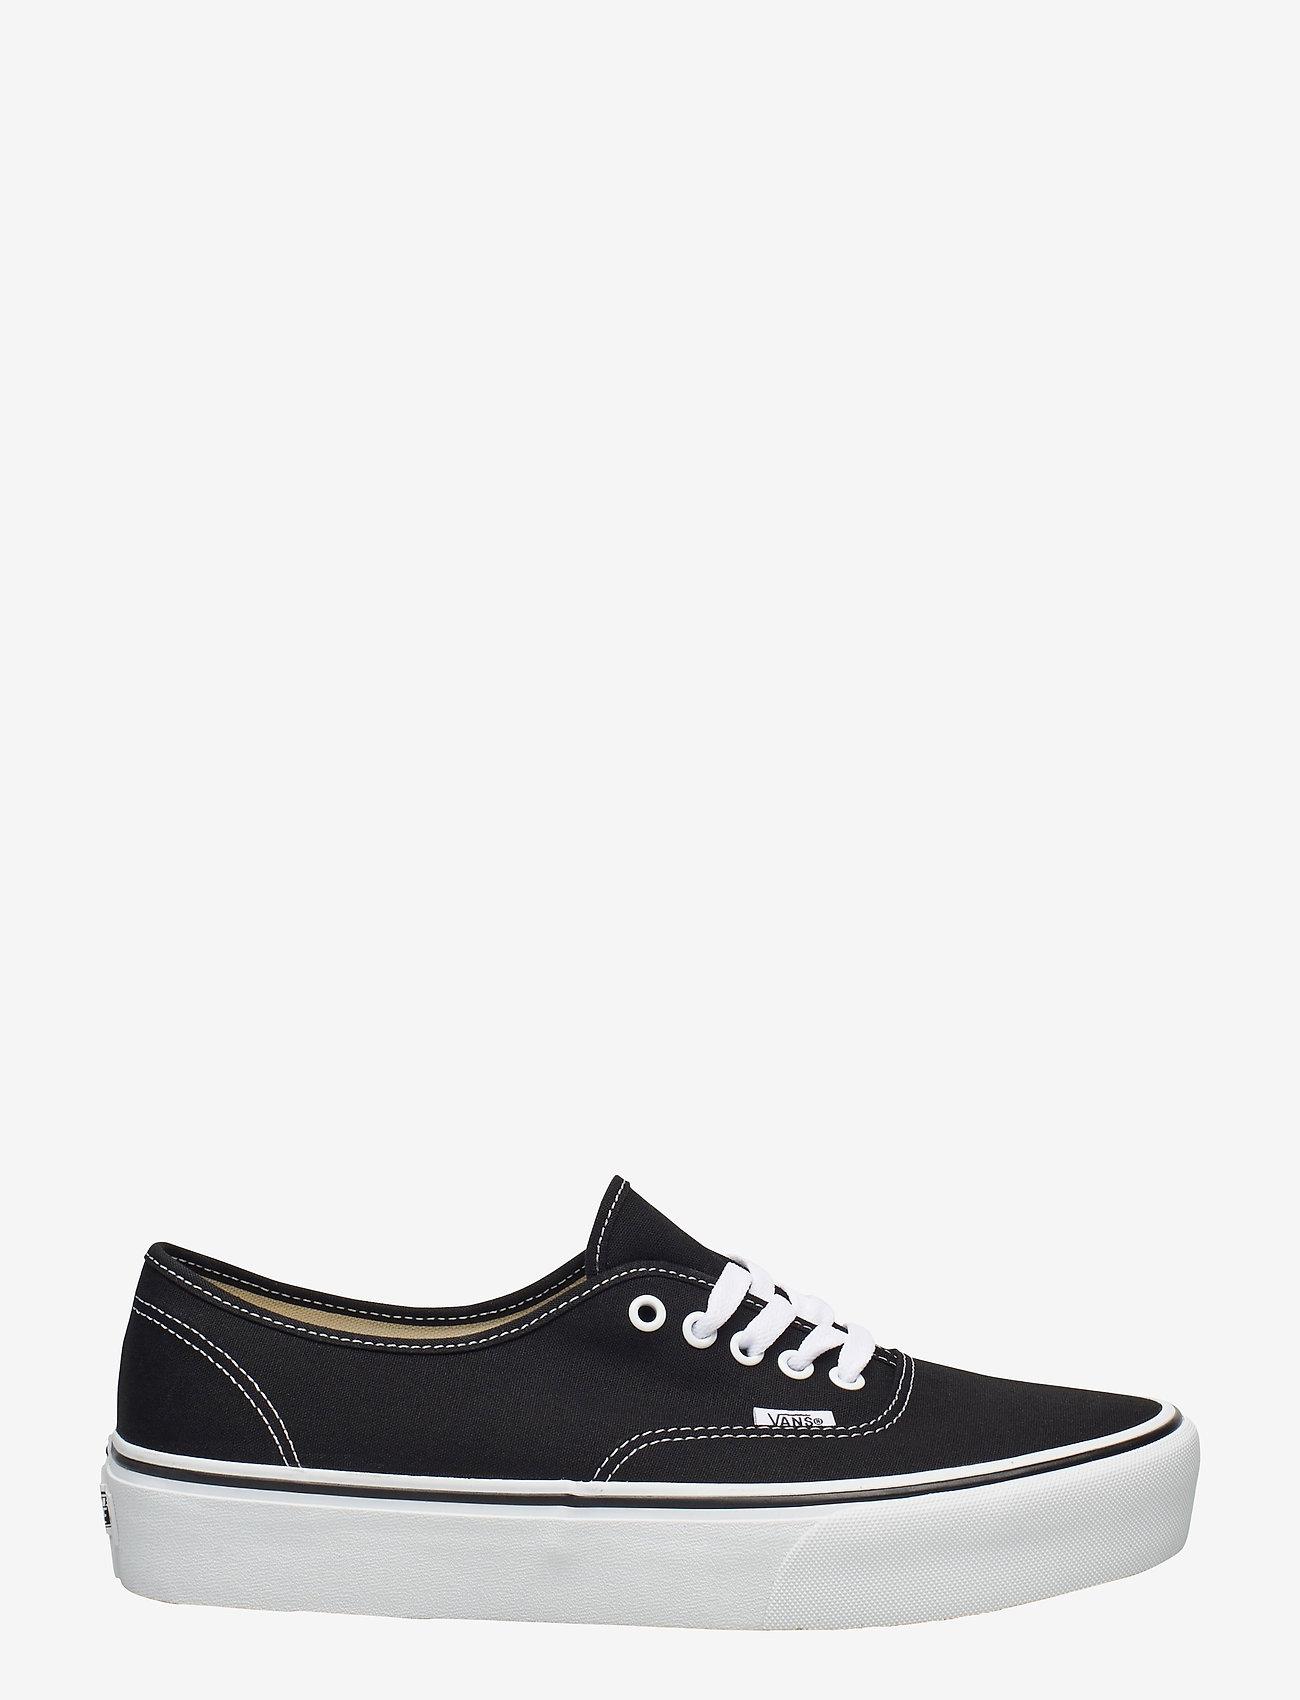 VANS - UA Authentic Platform 2.0 - laag sneakers - black - 1